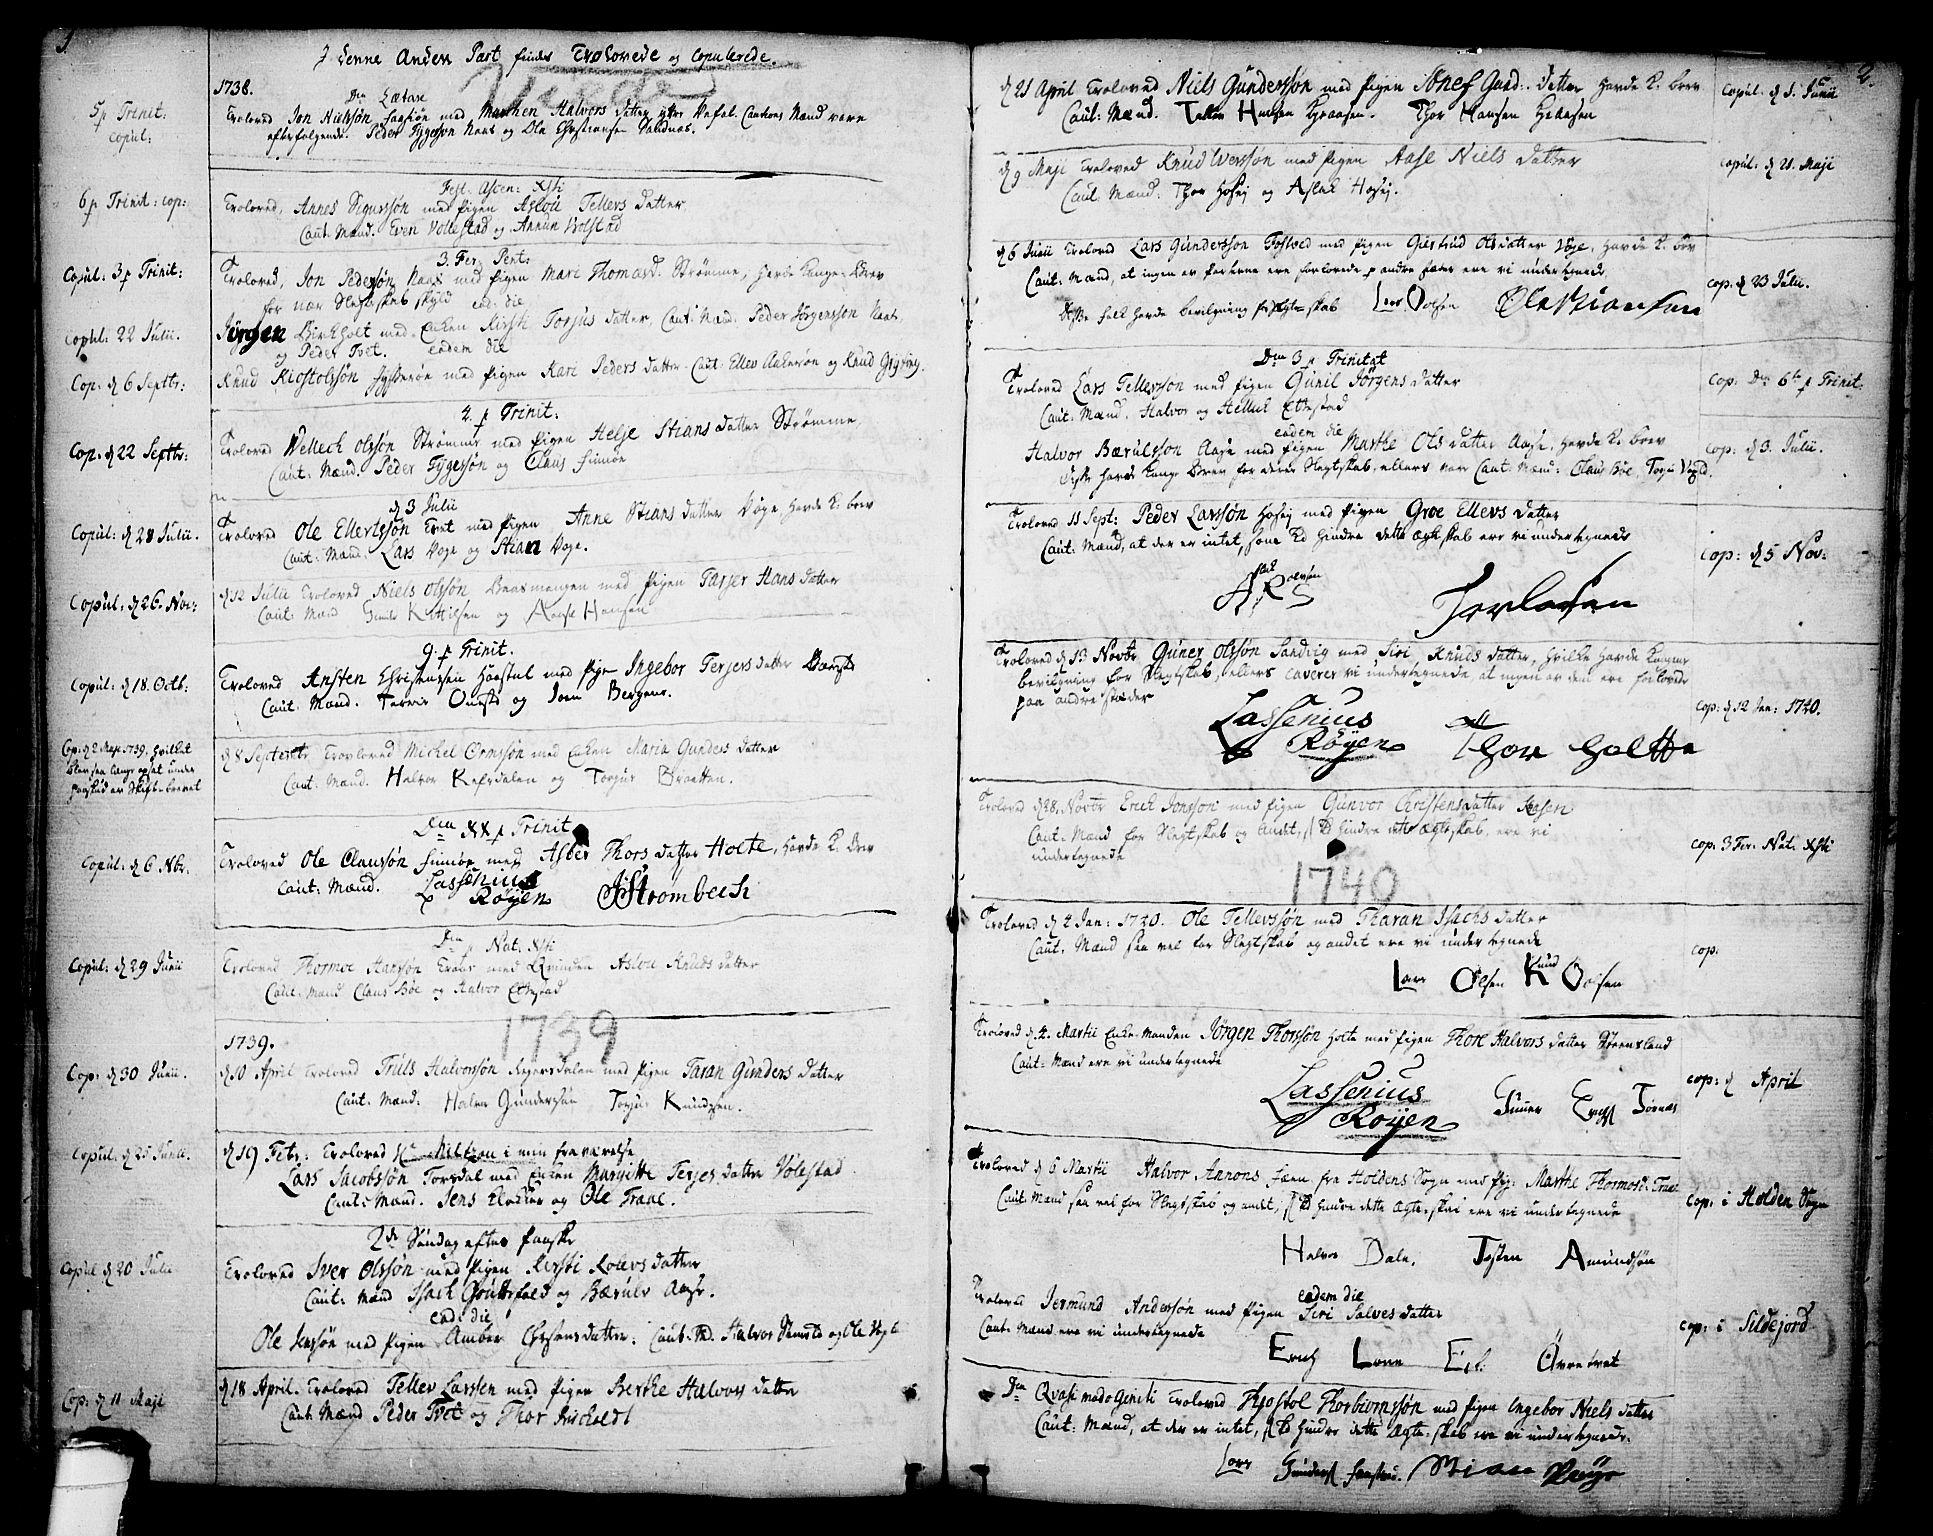 SAKO, Drangedal kirkebøker, F/Fa/L0001: Ministerialbok nr. 1, 1697-1767, s. 1-2